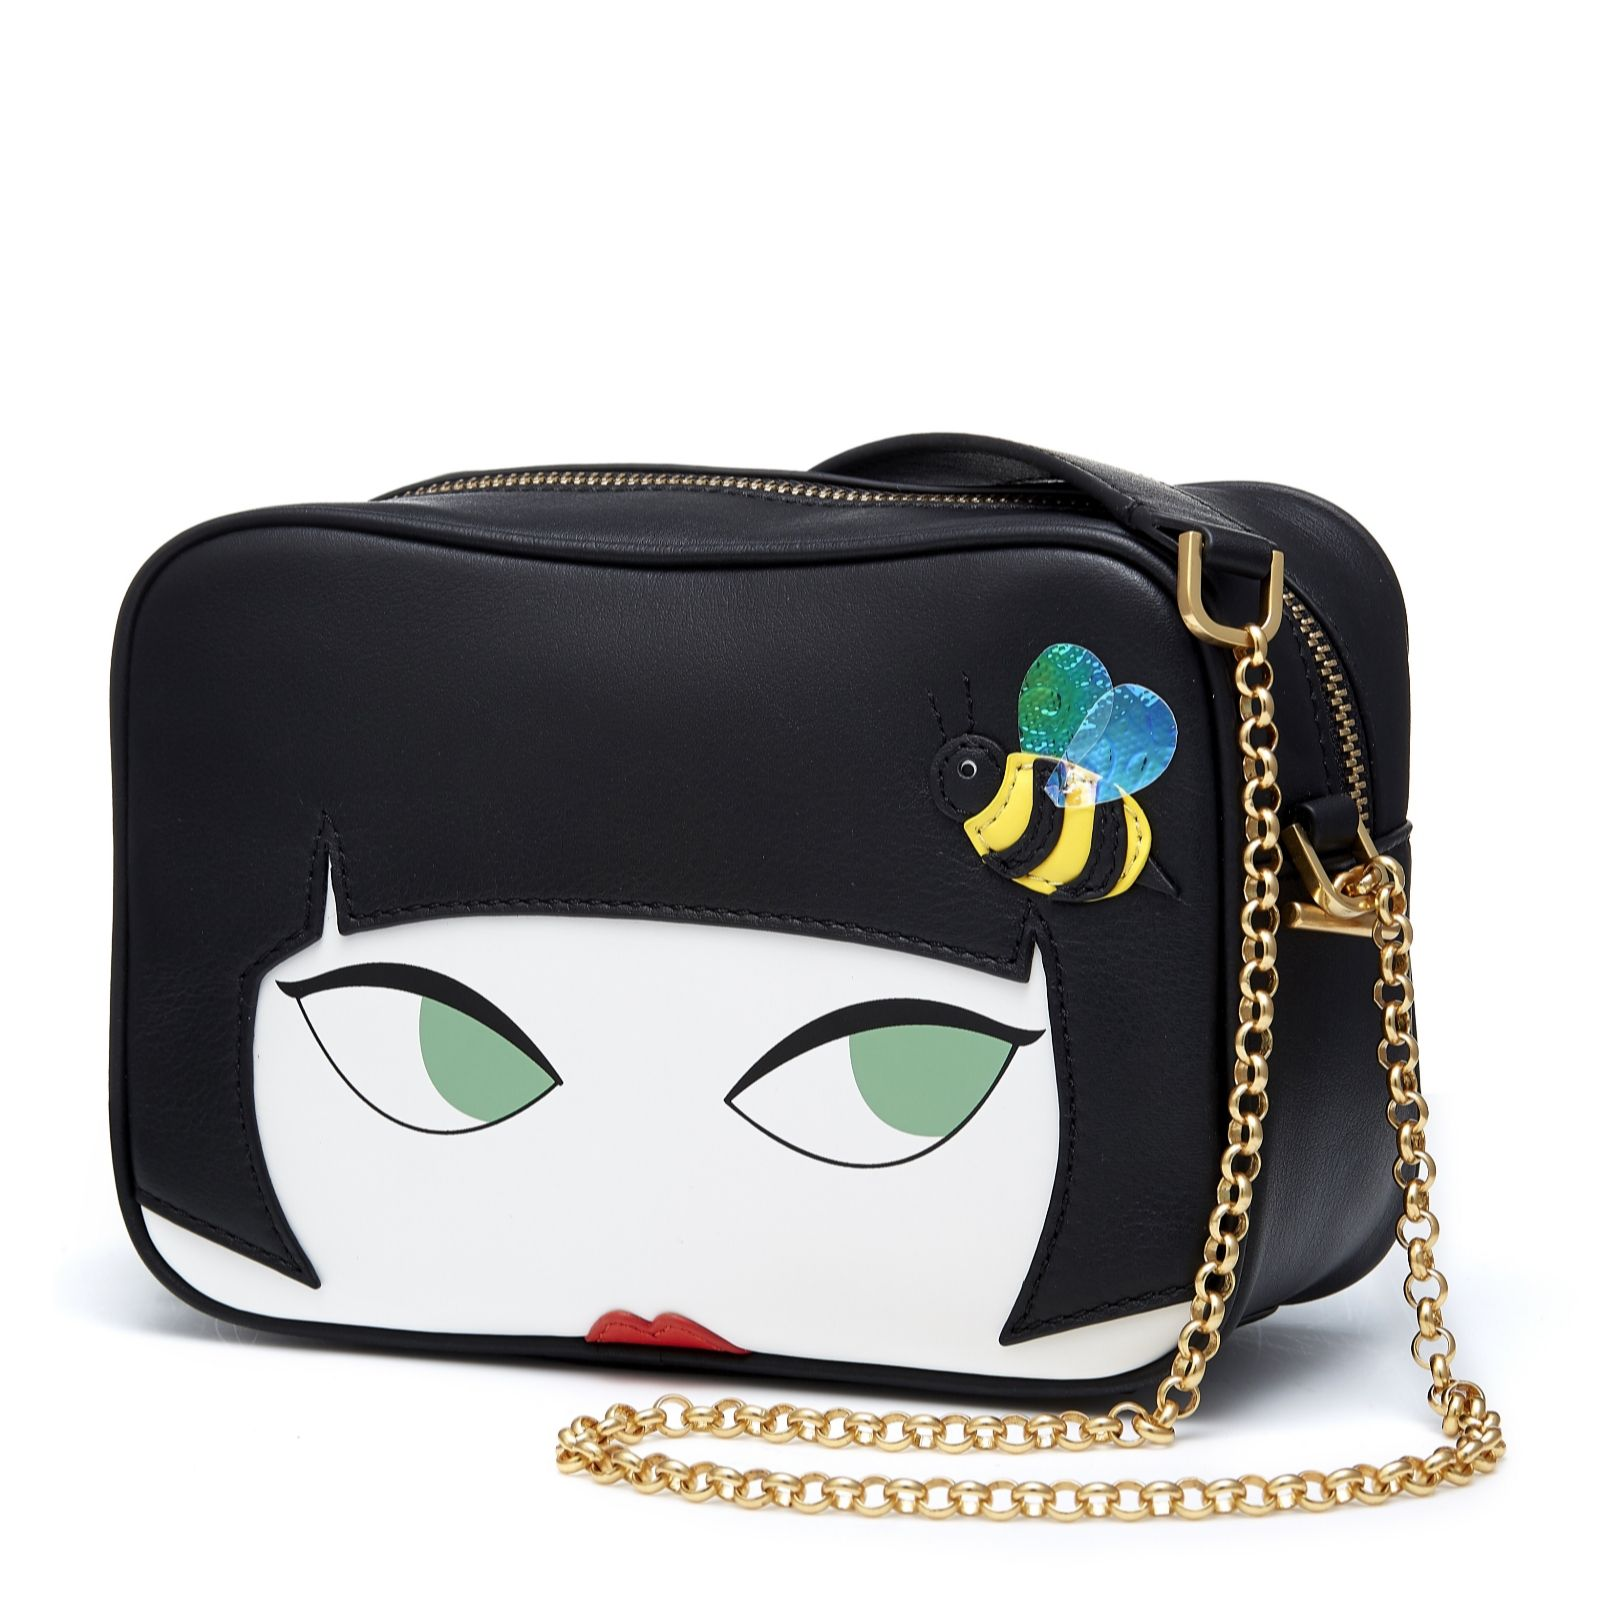 e00071175d52 Lulu Guinness Amber Crossbody Bag - QVC UK